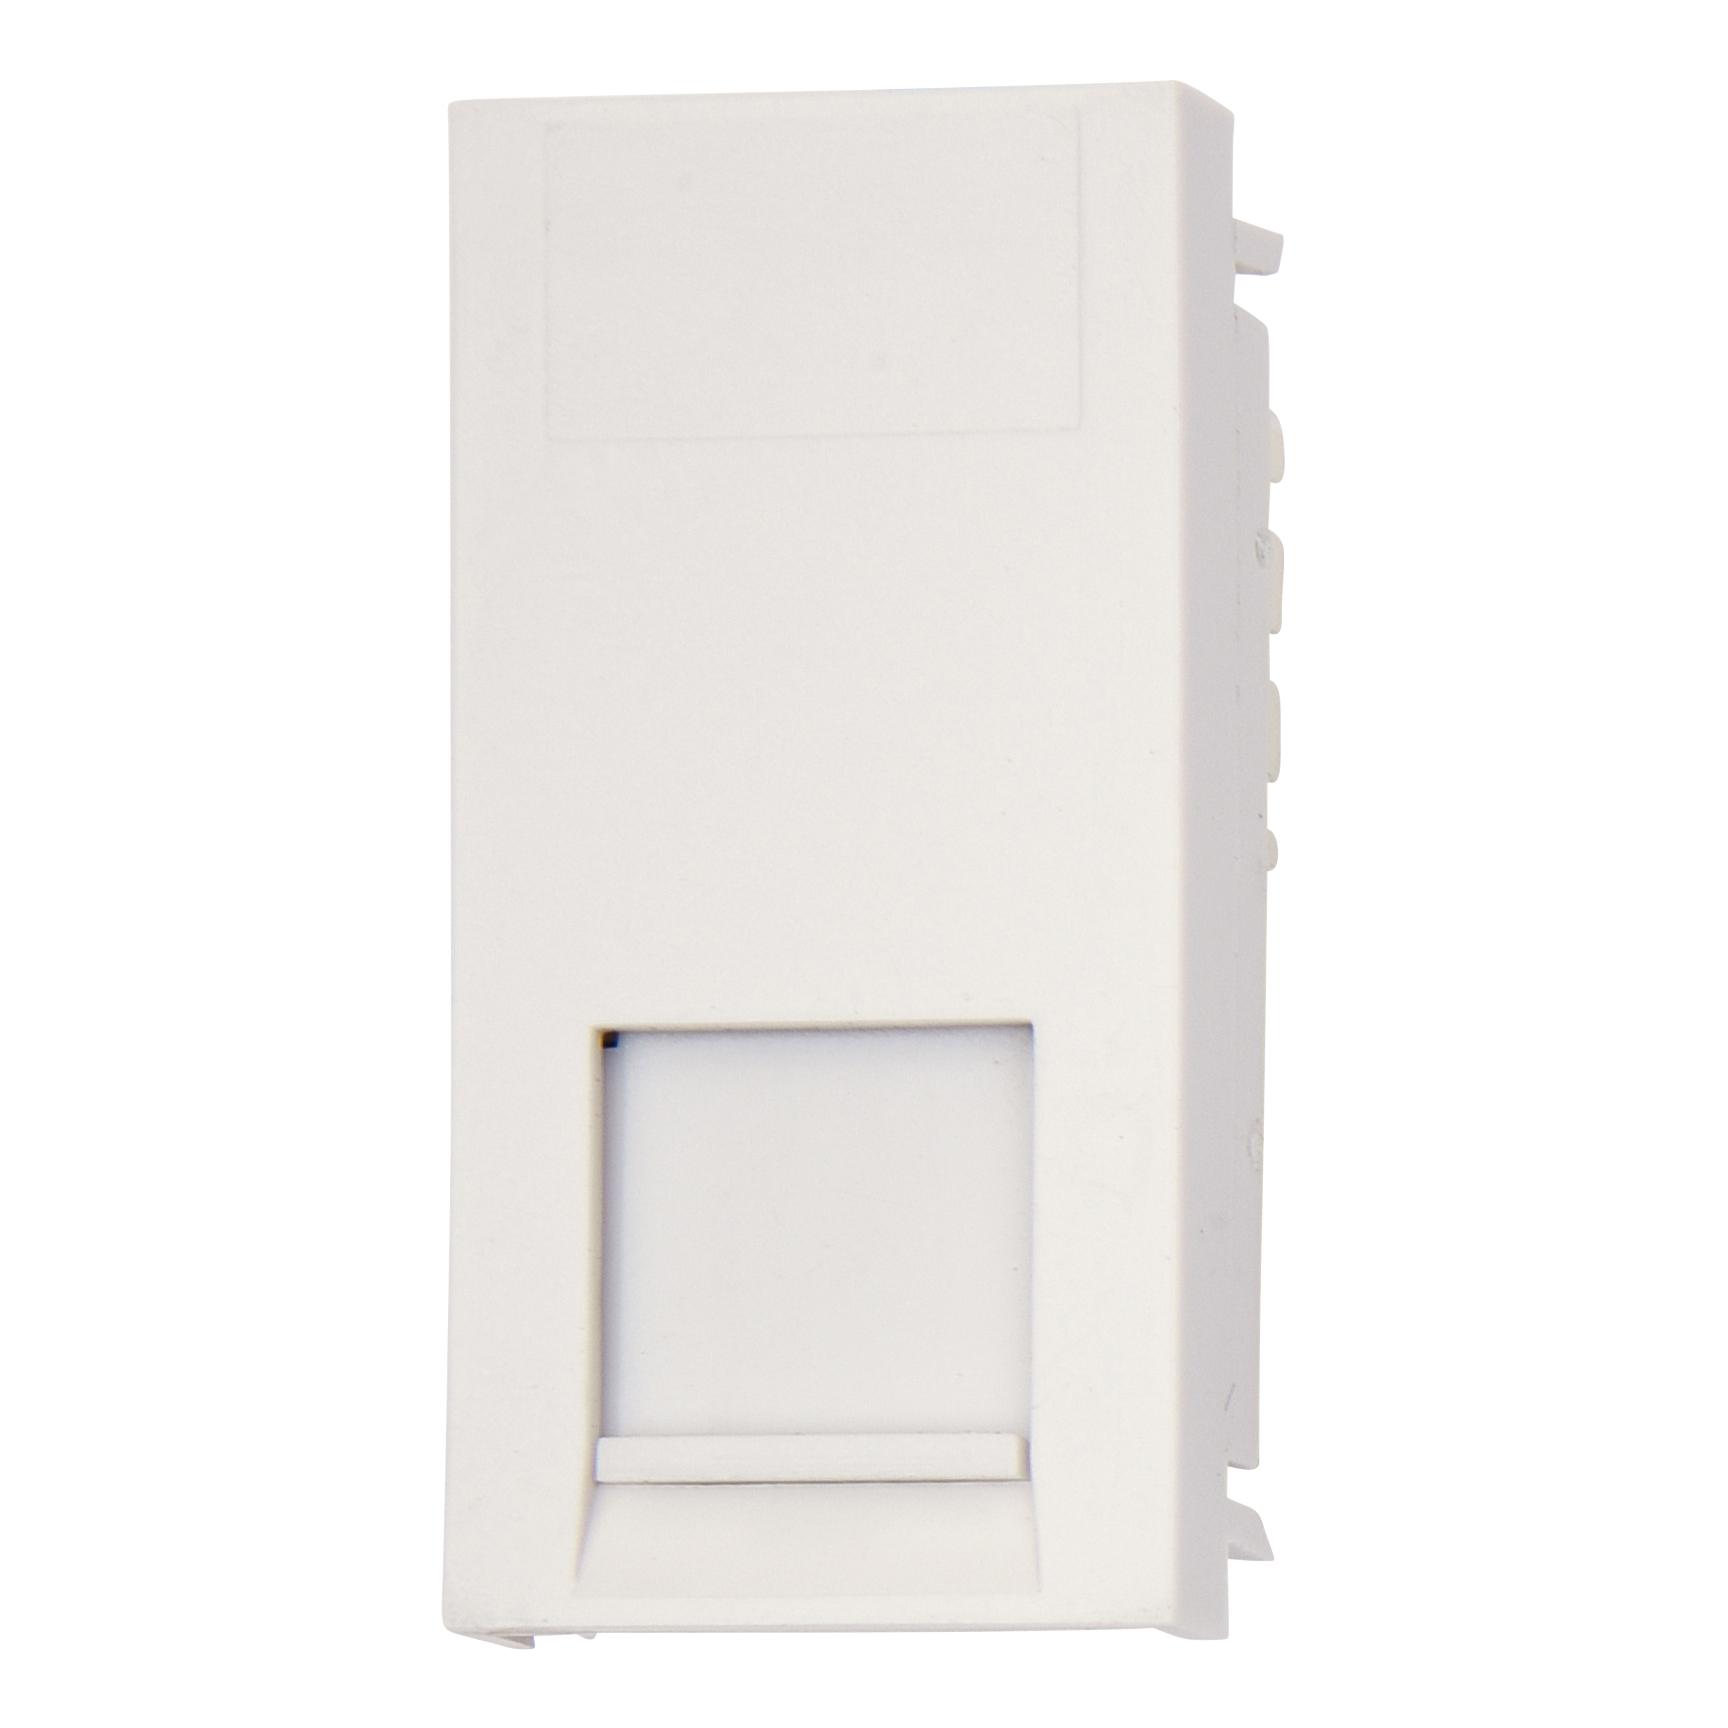 Deta RJ11 Telephone Module - White)